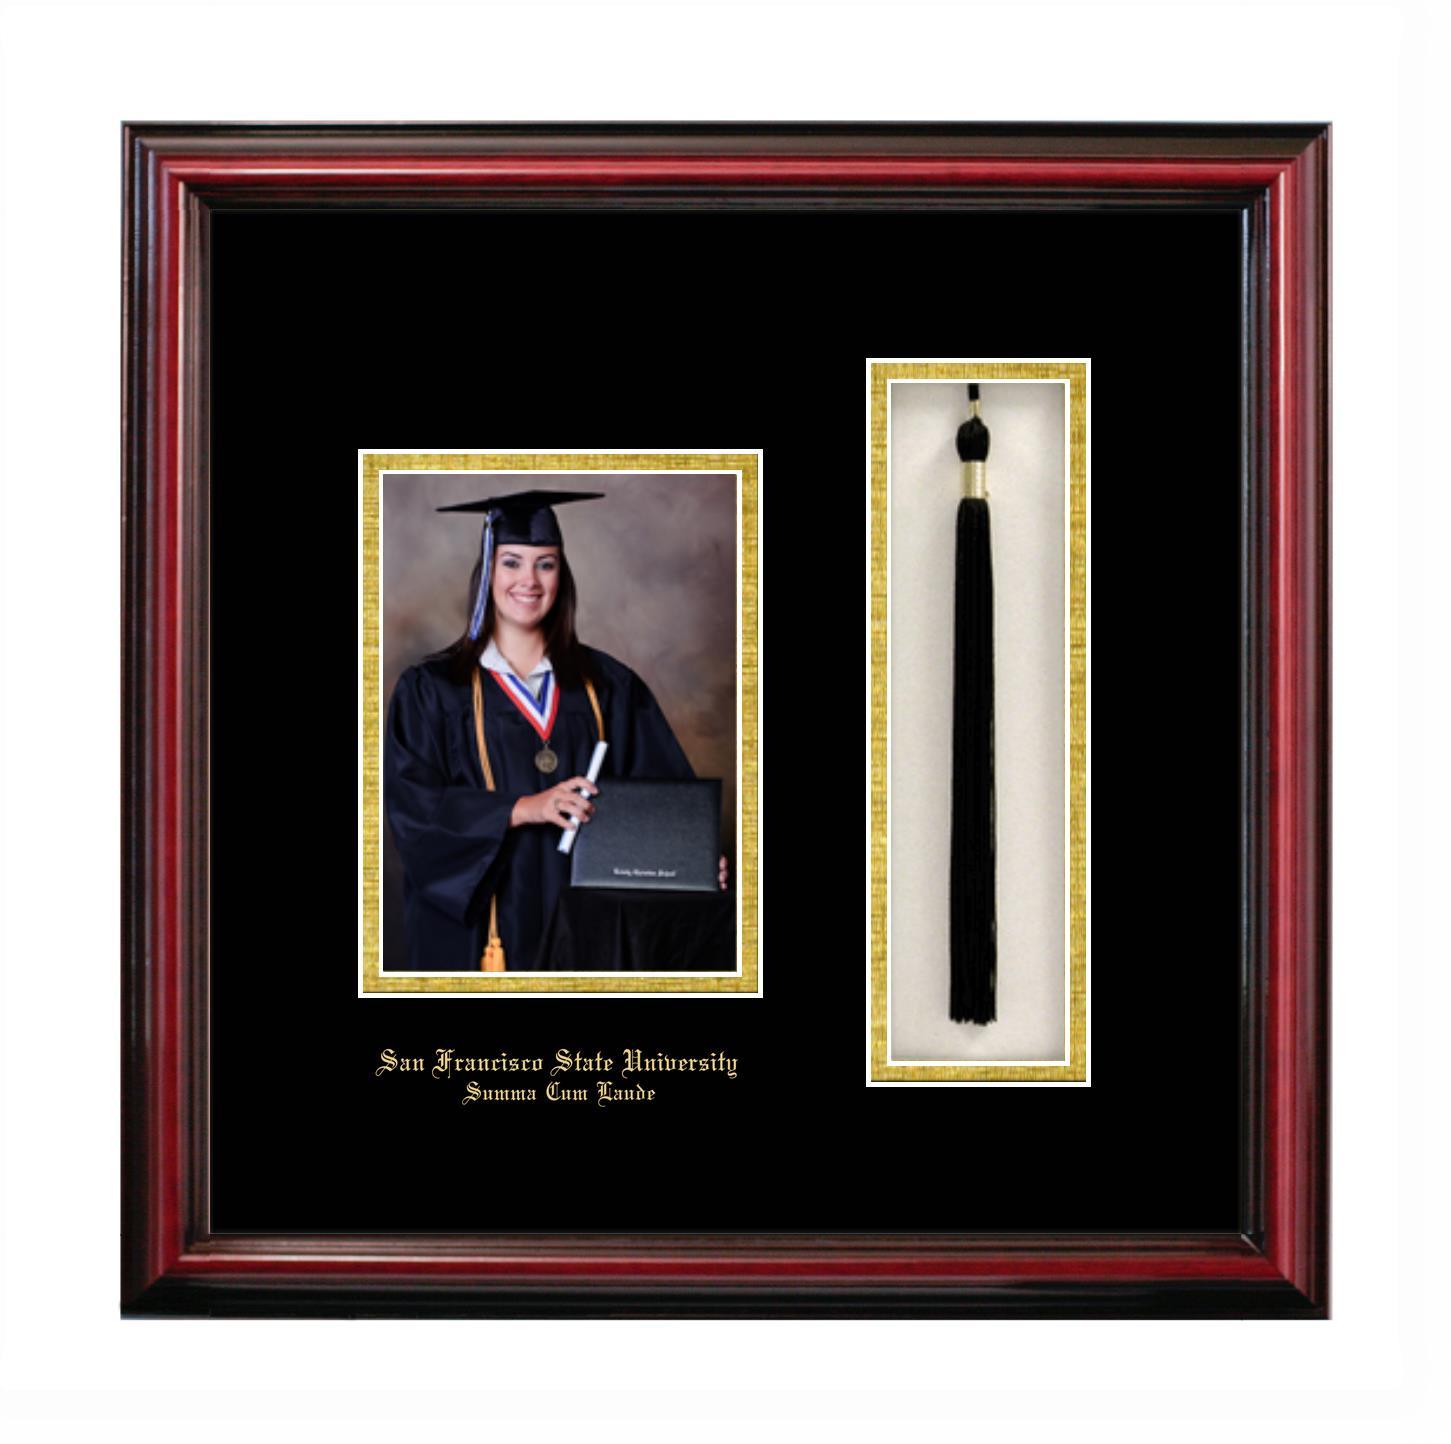 San Francisco State University Summa Cum Laude 5x7 Portrait With Tassel Box Frame In Petite Cherry With Black Gold Mats